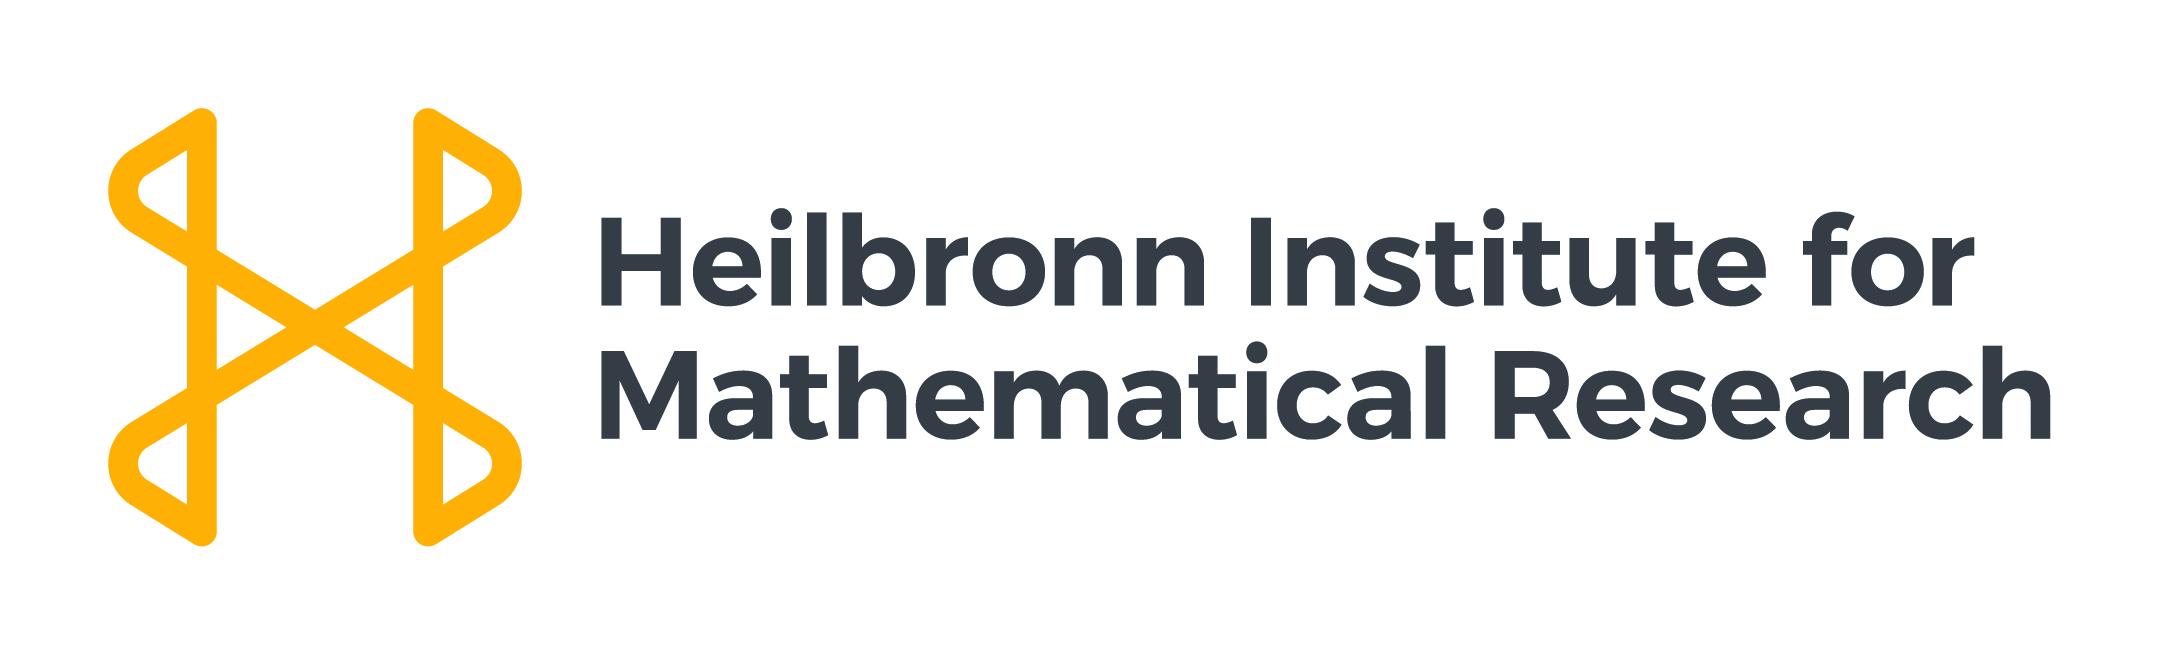 London paris number theory seminar erc logo heilbronn logo epsrc logo the london paris number theory publicscrutiny Image collections